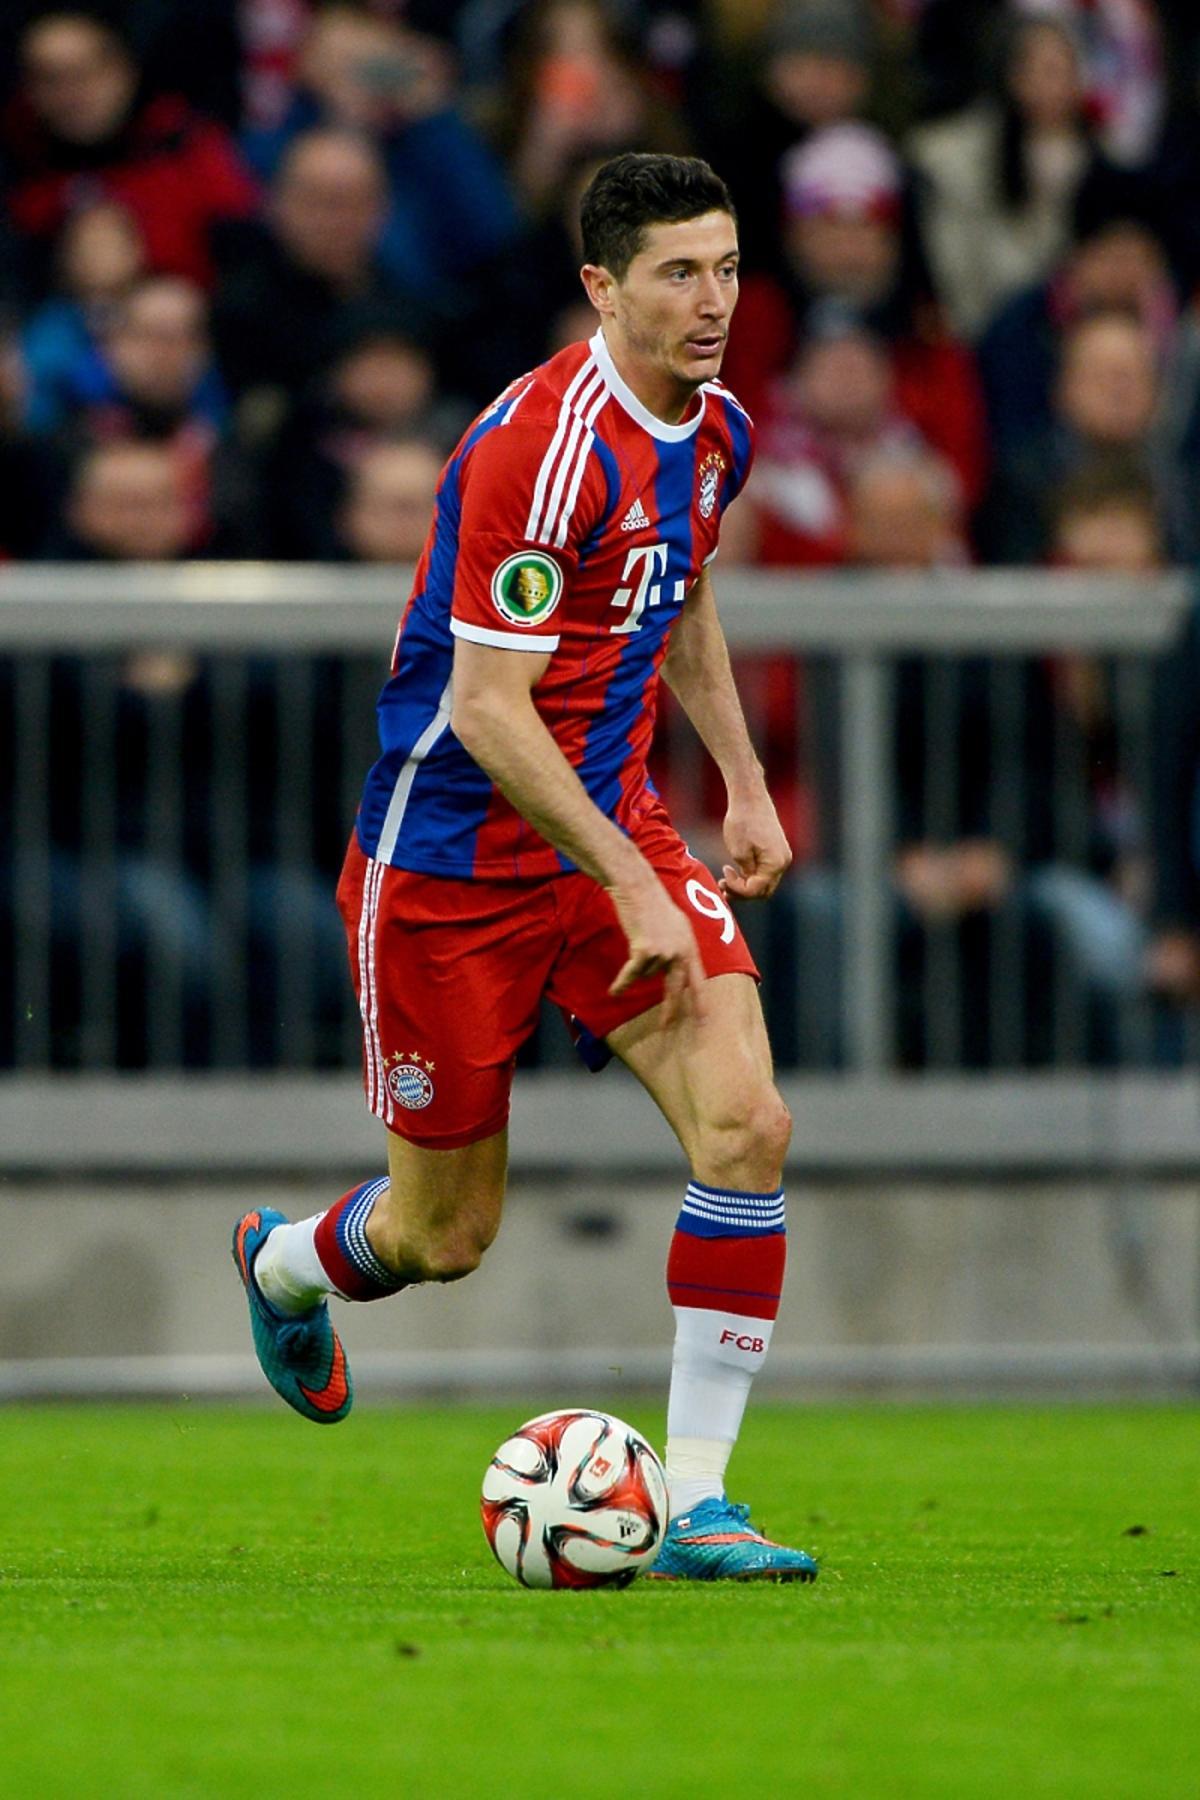 Robert Lewandowski strzelił 5 goli w 10 minut